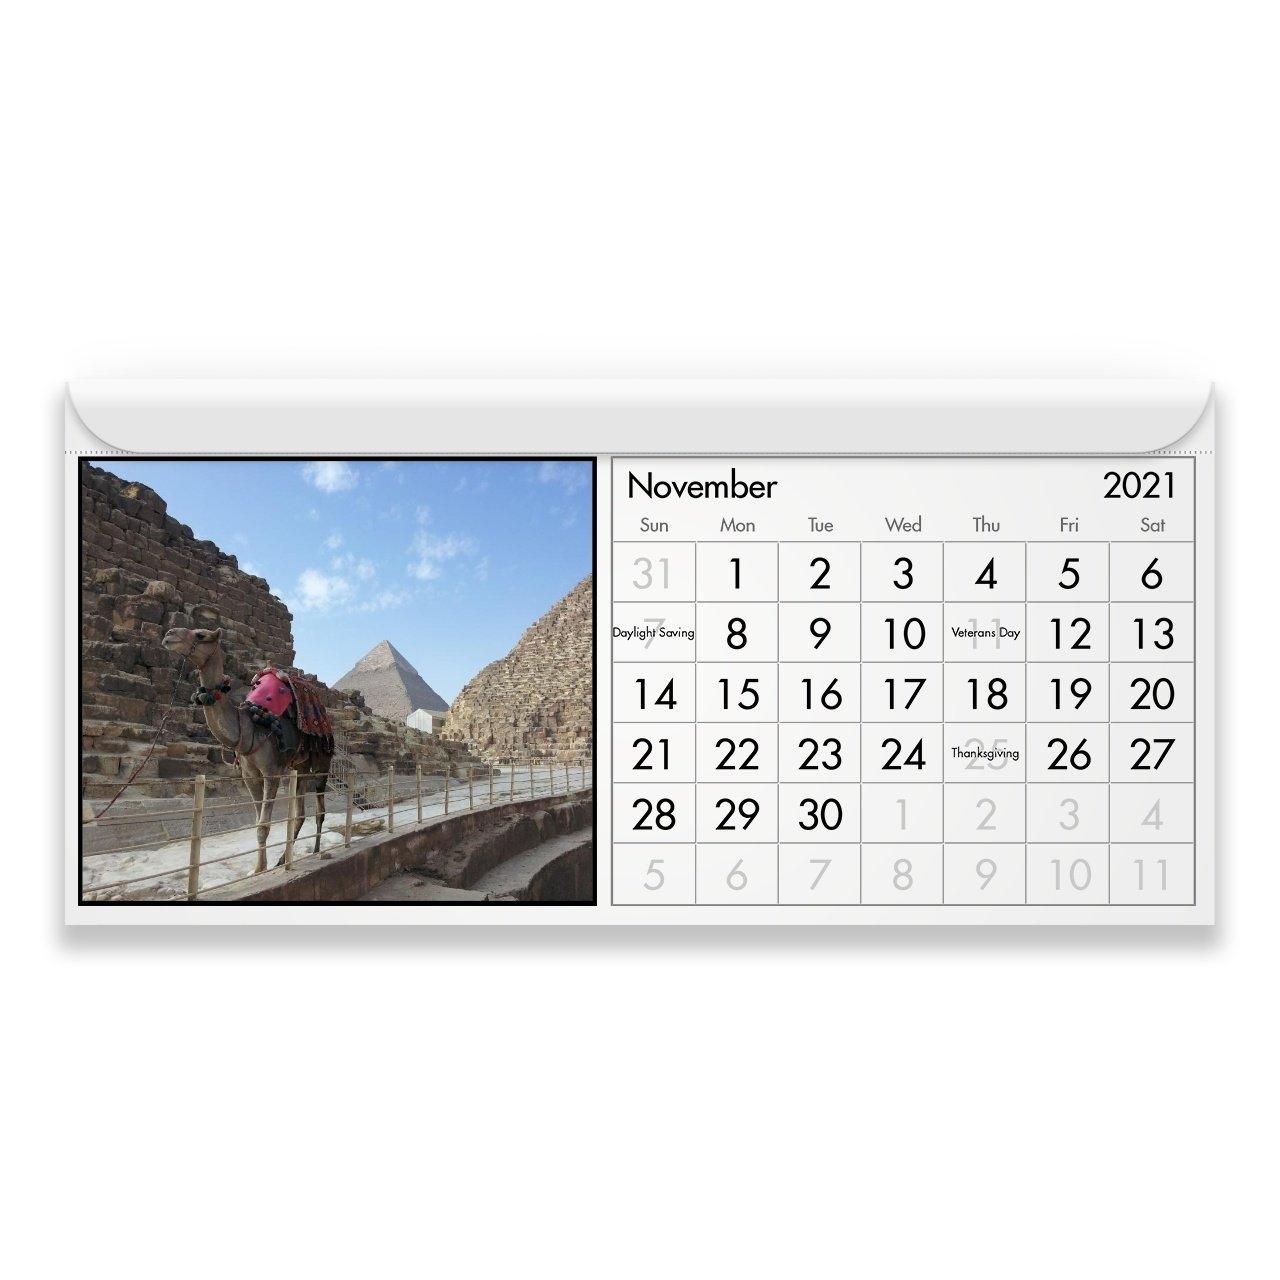 Egypti 2021 Magneettinen Kalenteri for Egypt Holiday Calendar 2021 Photo